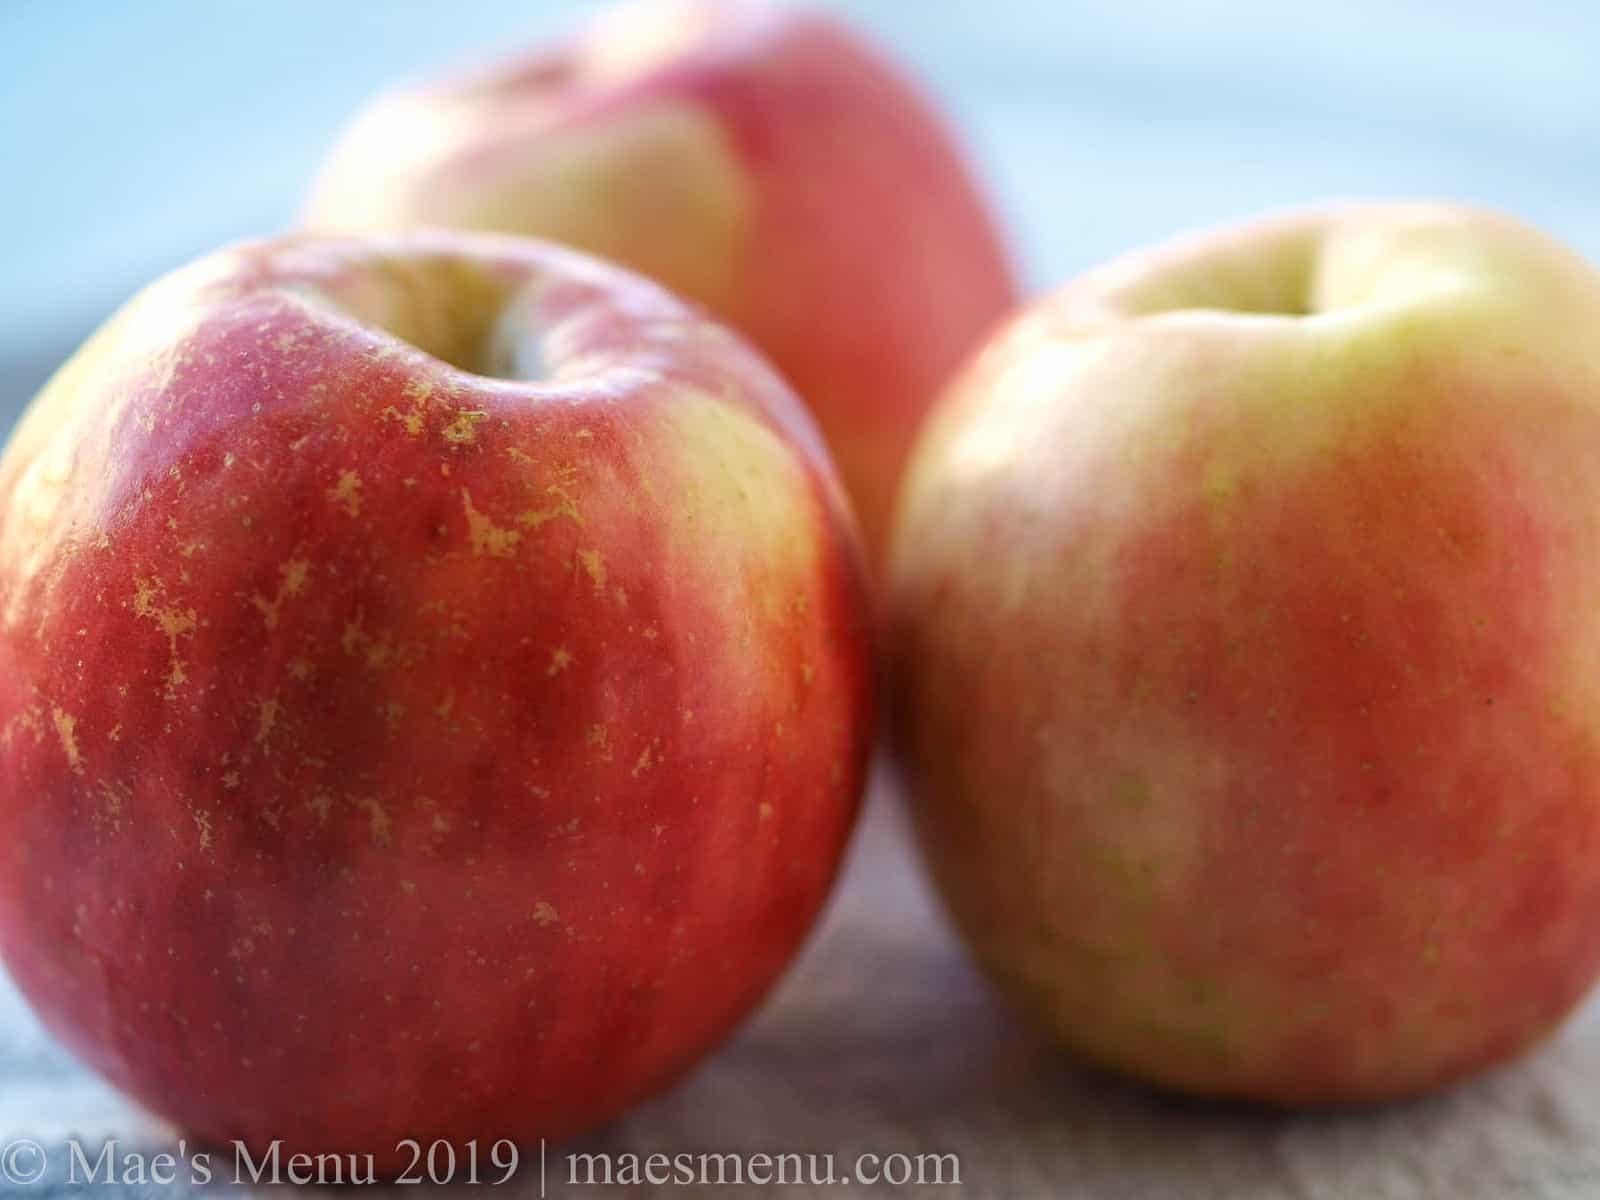 up-close shot of 3 fuji apples.